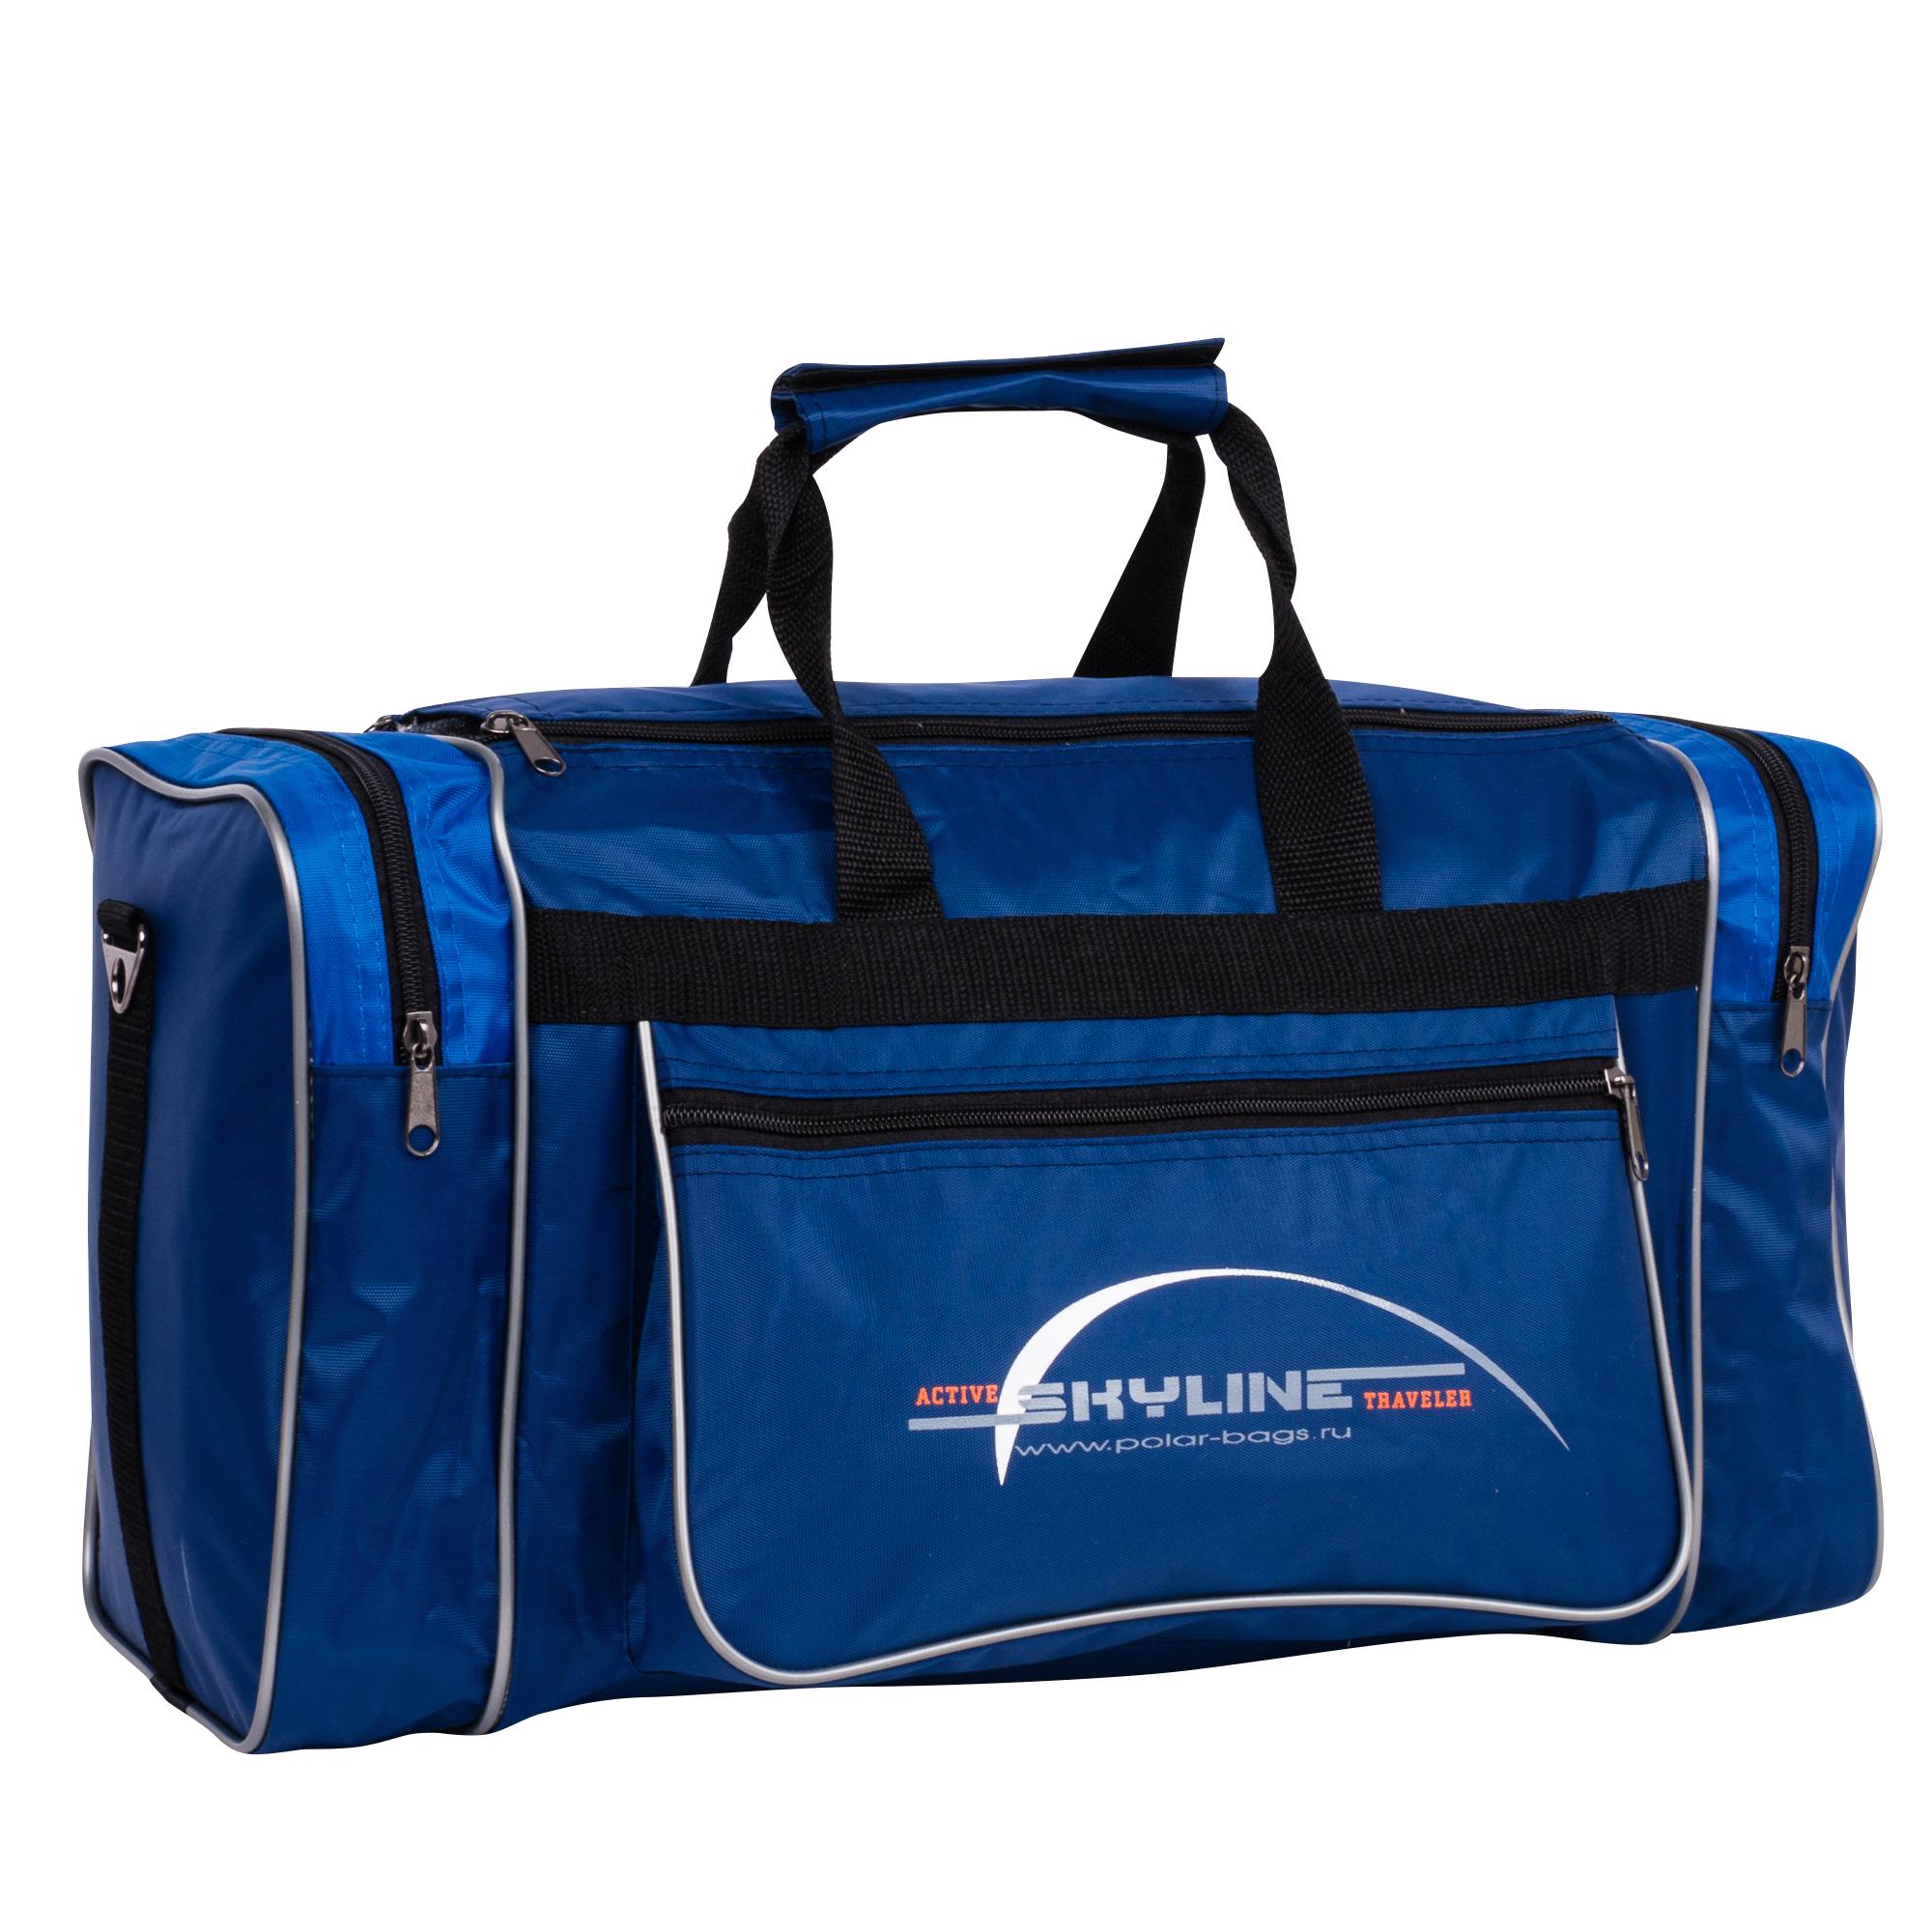 Спортивная сумка Polar Джонсон Нейлон 6009с синяя